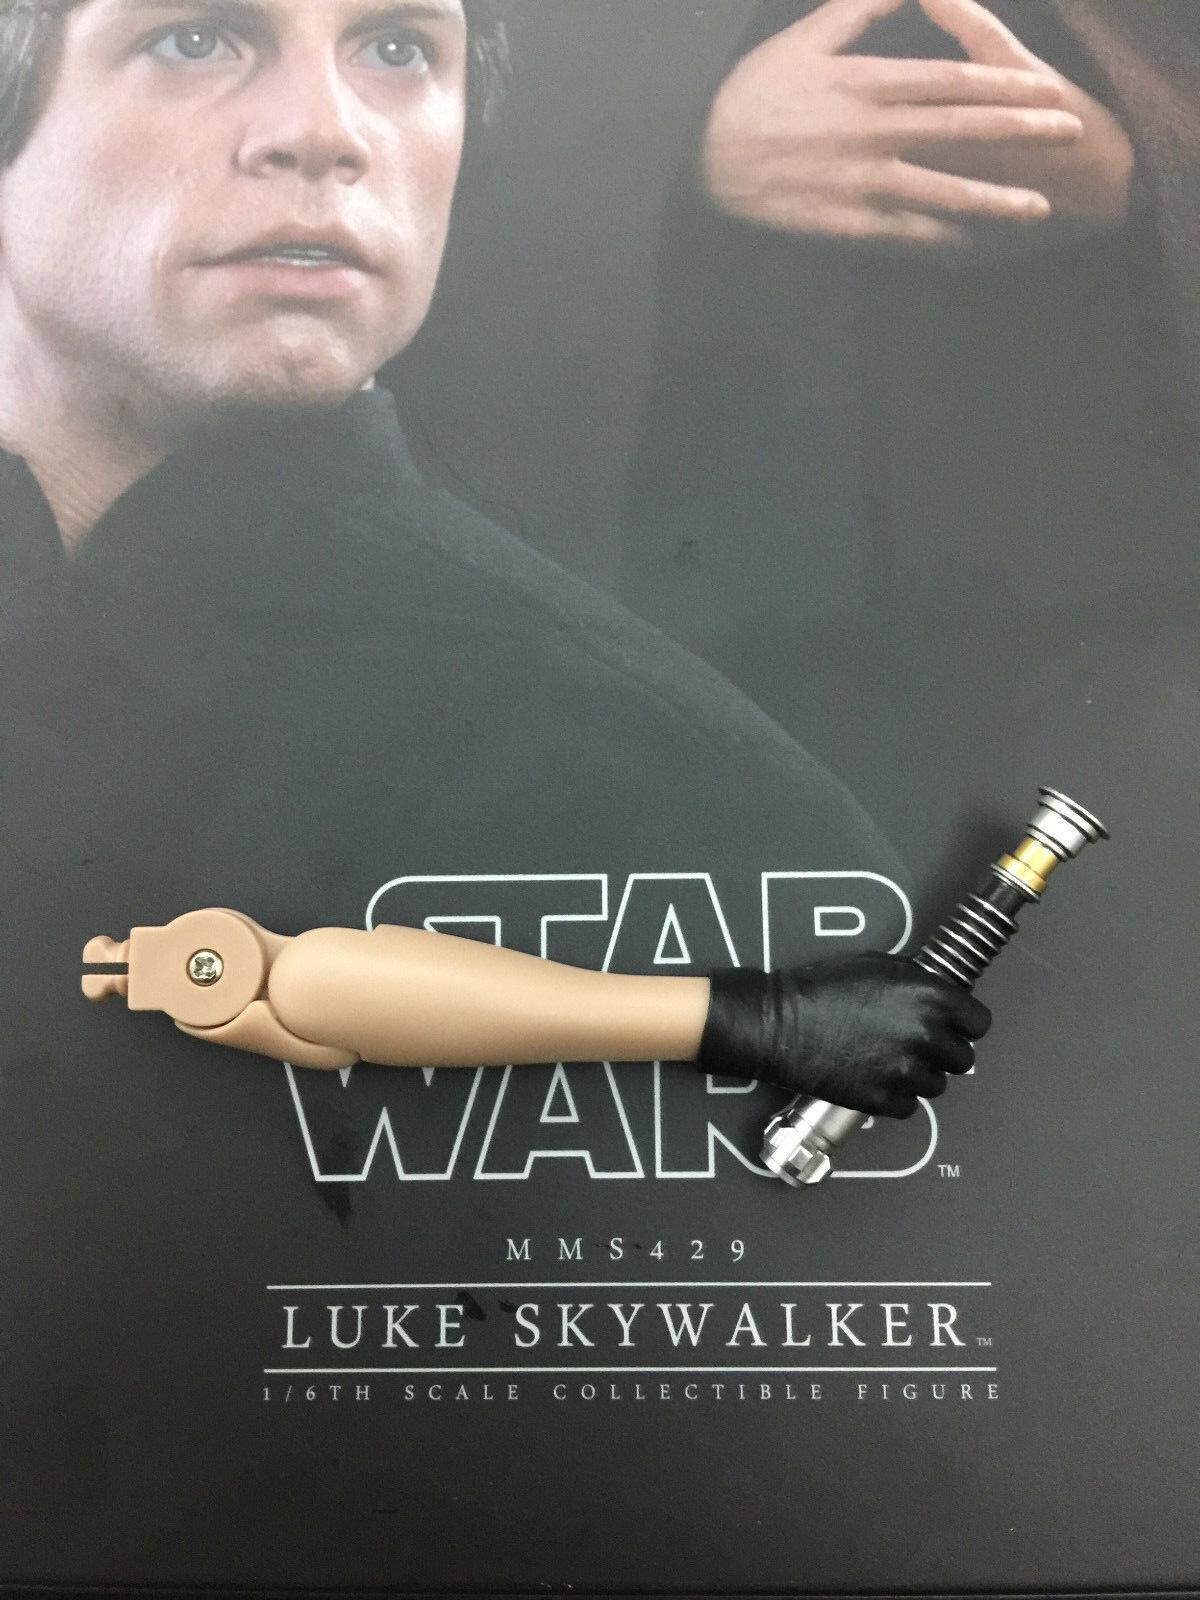 Caliente giocattoli estrella guerras Luke cielowalker MMS429 Return Of  The Jedi - LED Light-up Arm  in cerca di agente di vendita